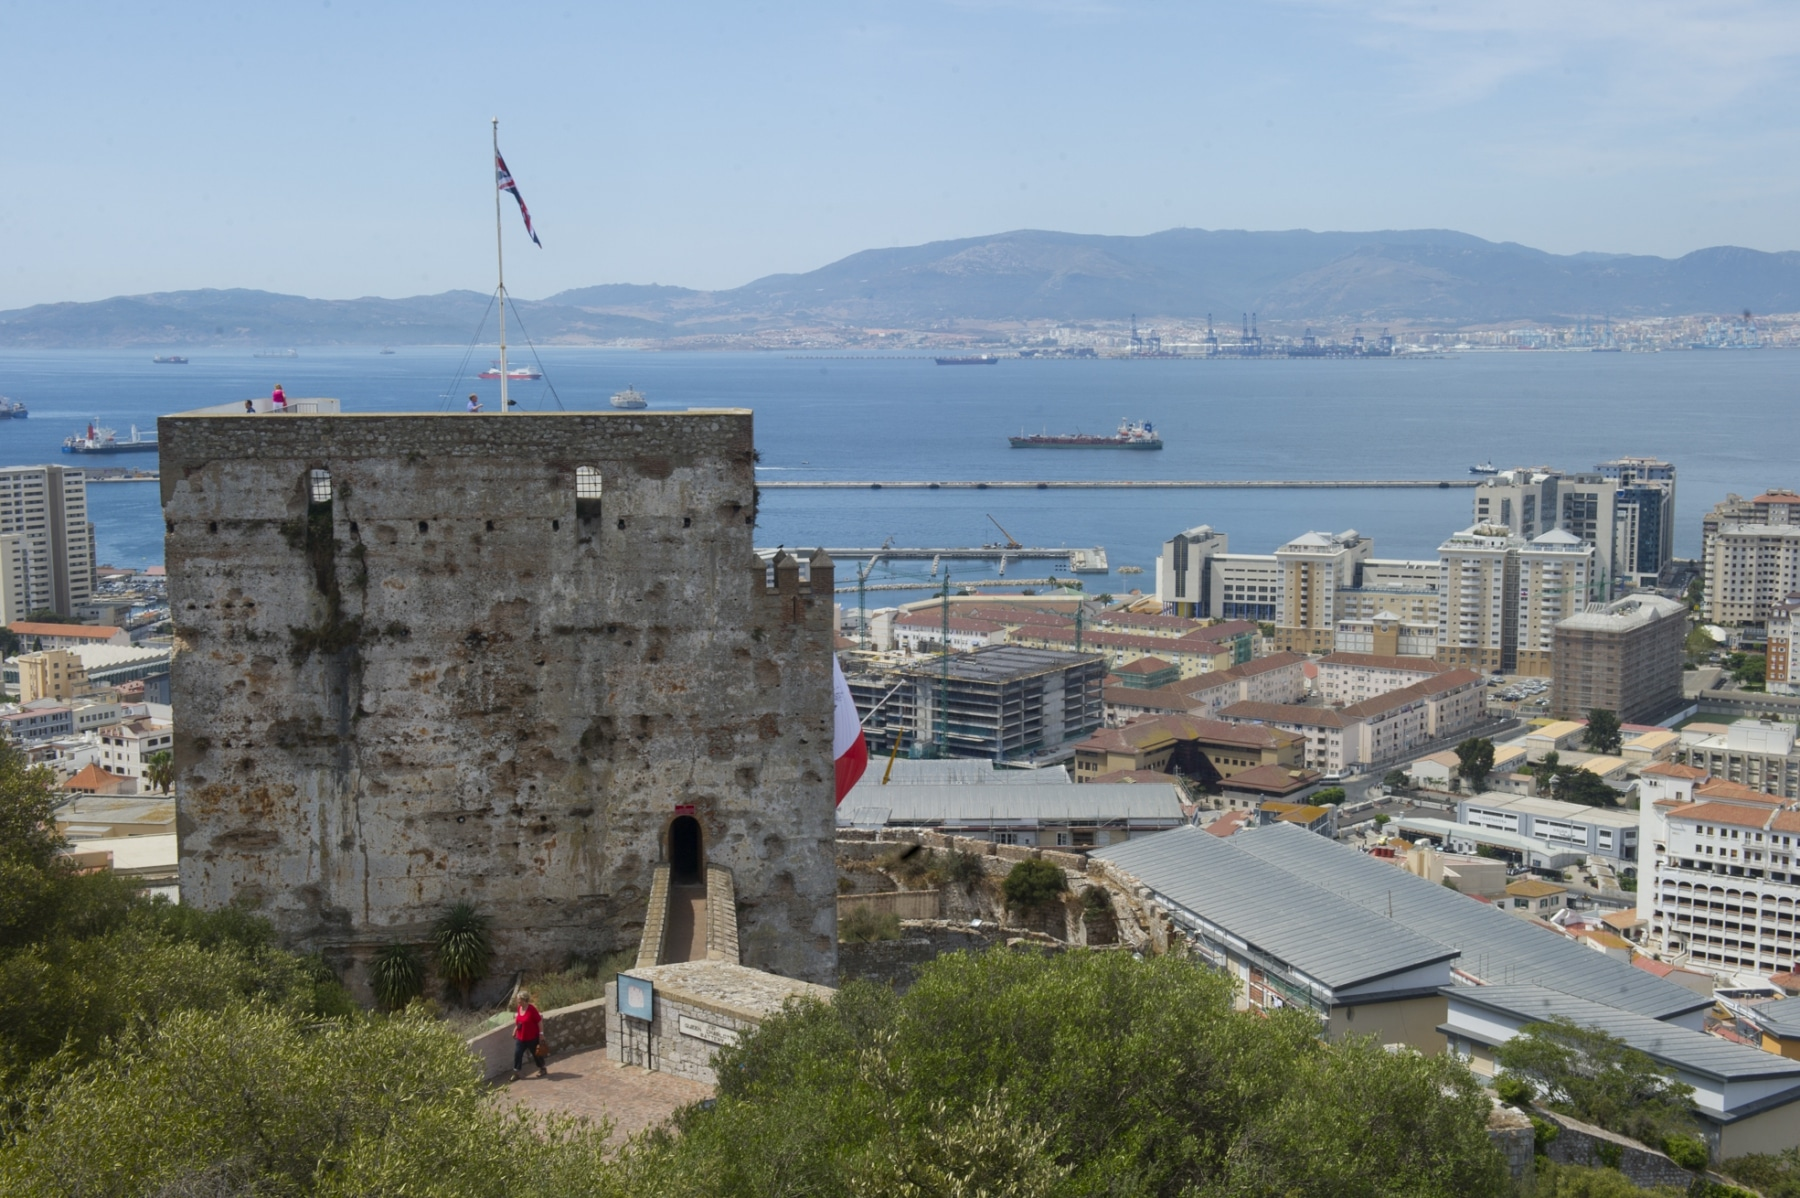 vistas-desde-el-castillo-moro-de-gibraltar_22552429930_o